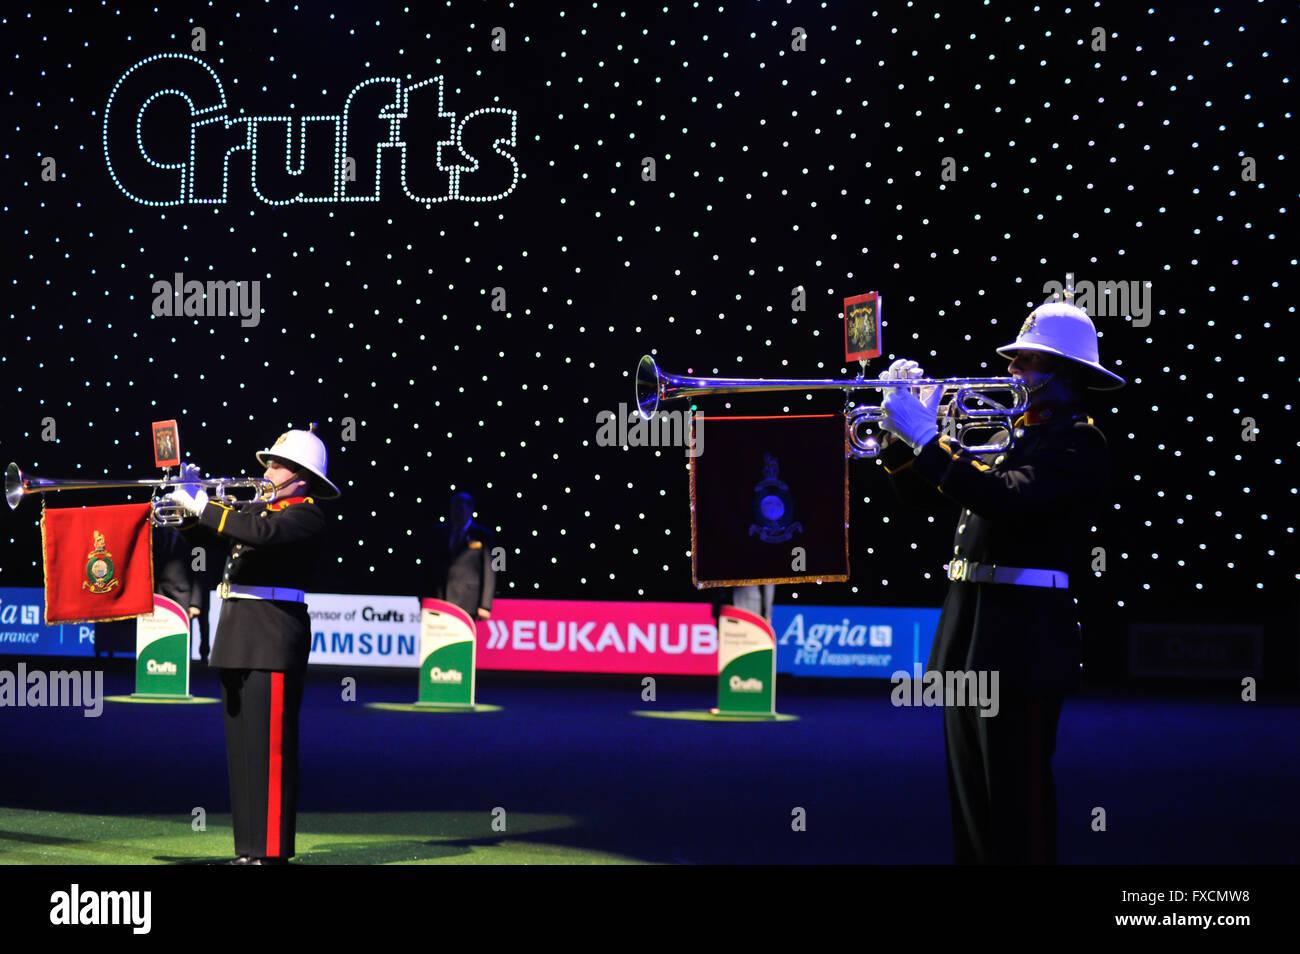 Crufts 2016 at NEC Birmingham - Day 4 - Best in Show Presentation